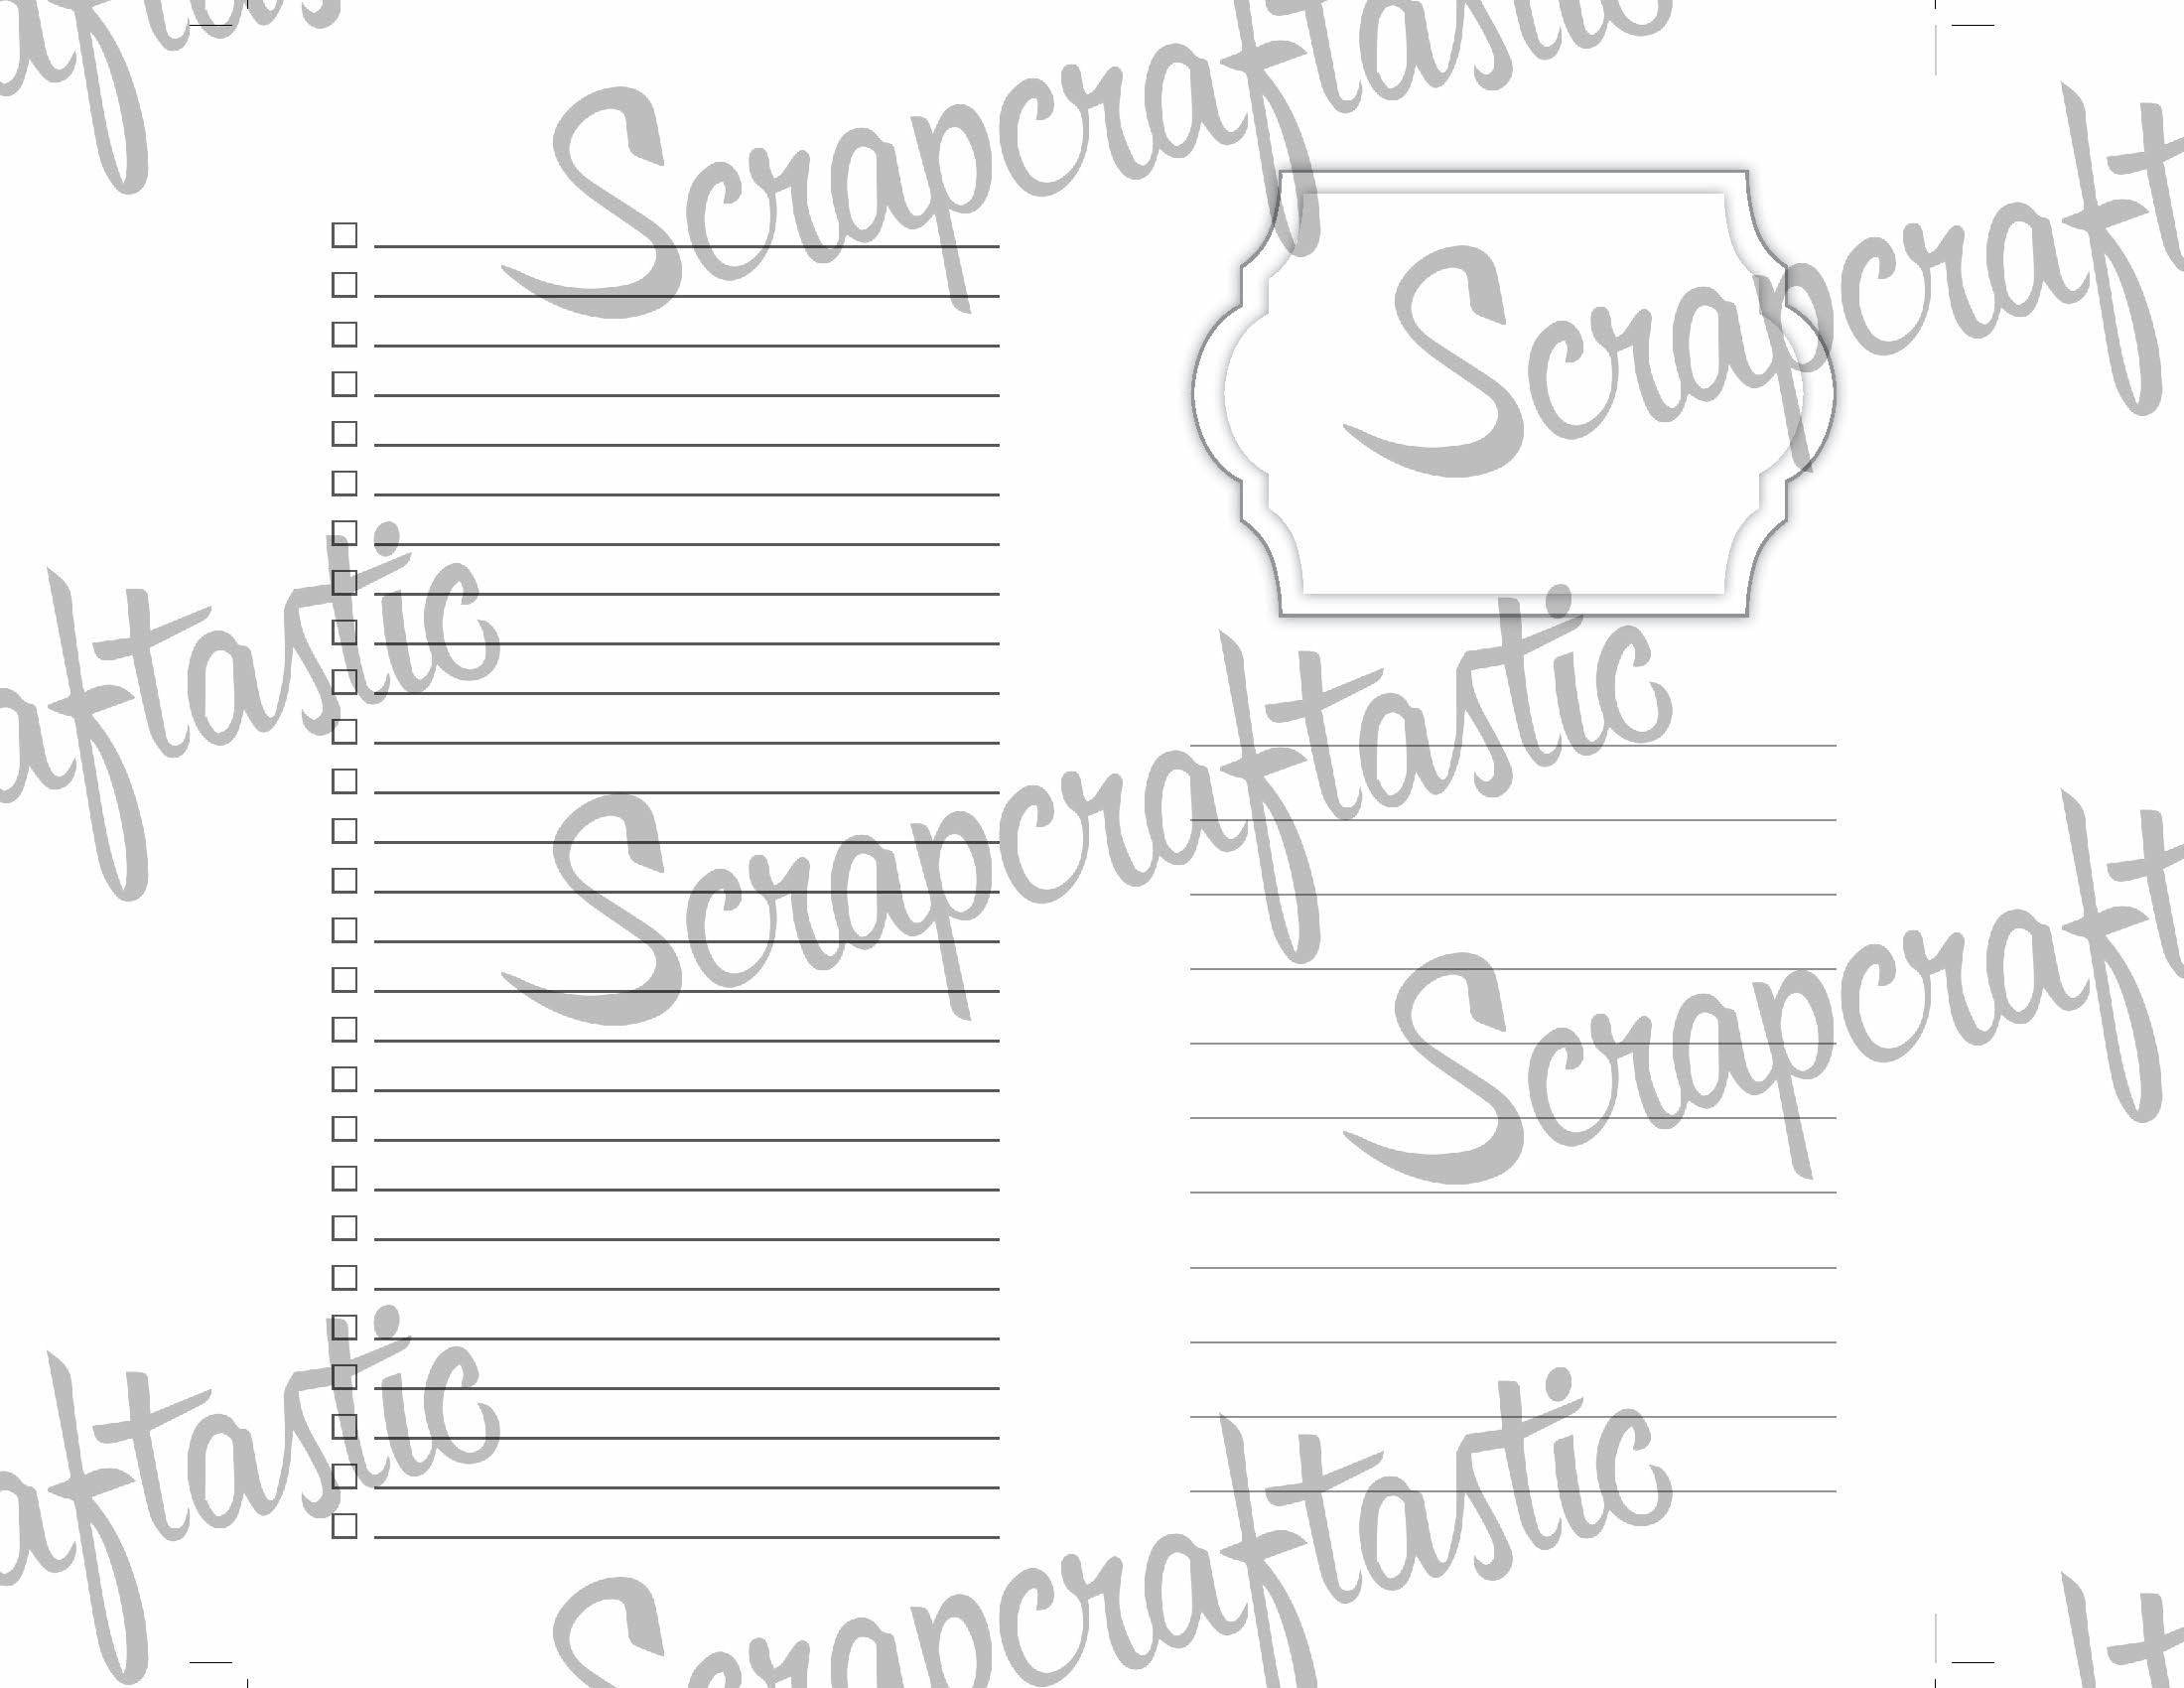 Full Notebook Dated: OCTOBER-DECEMBER / 4th Quarter 2017 B6 Size Printable Traveler's Notebook Insert